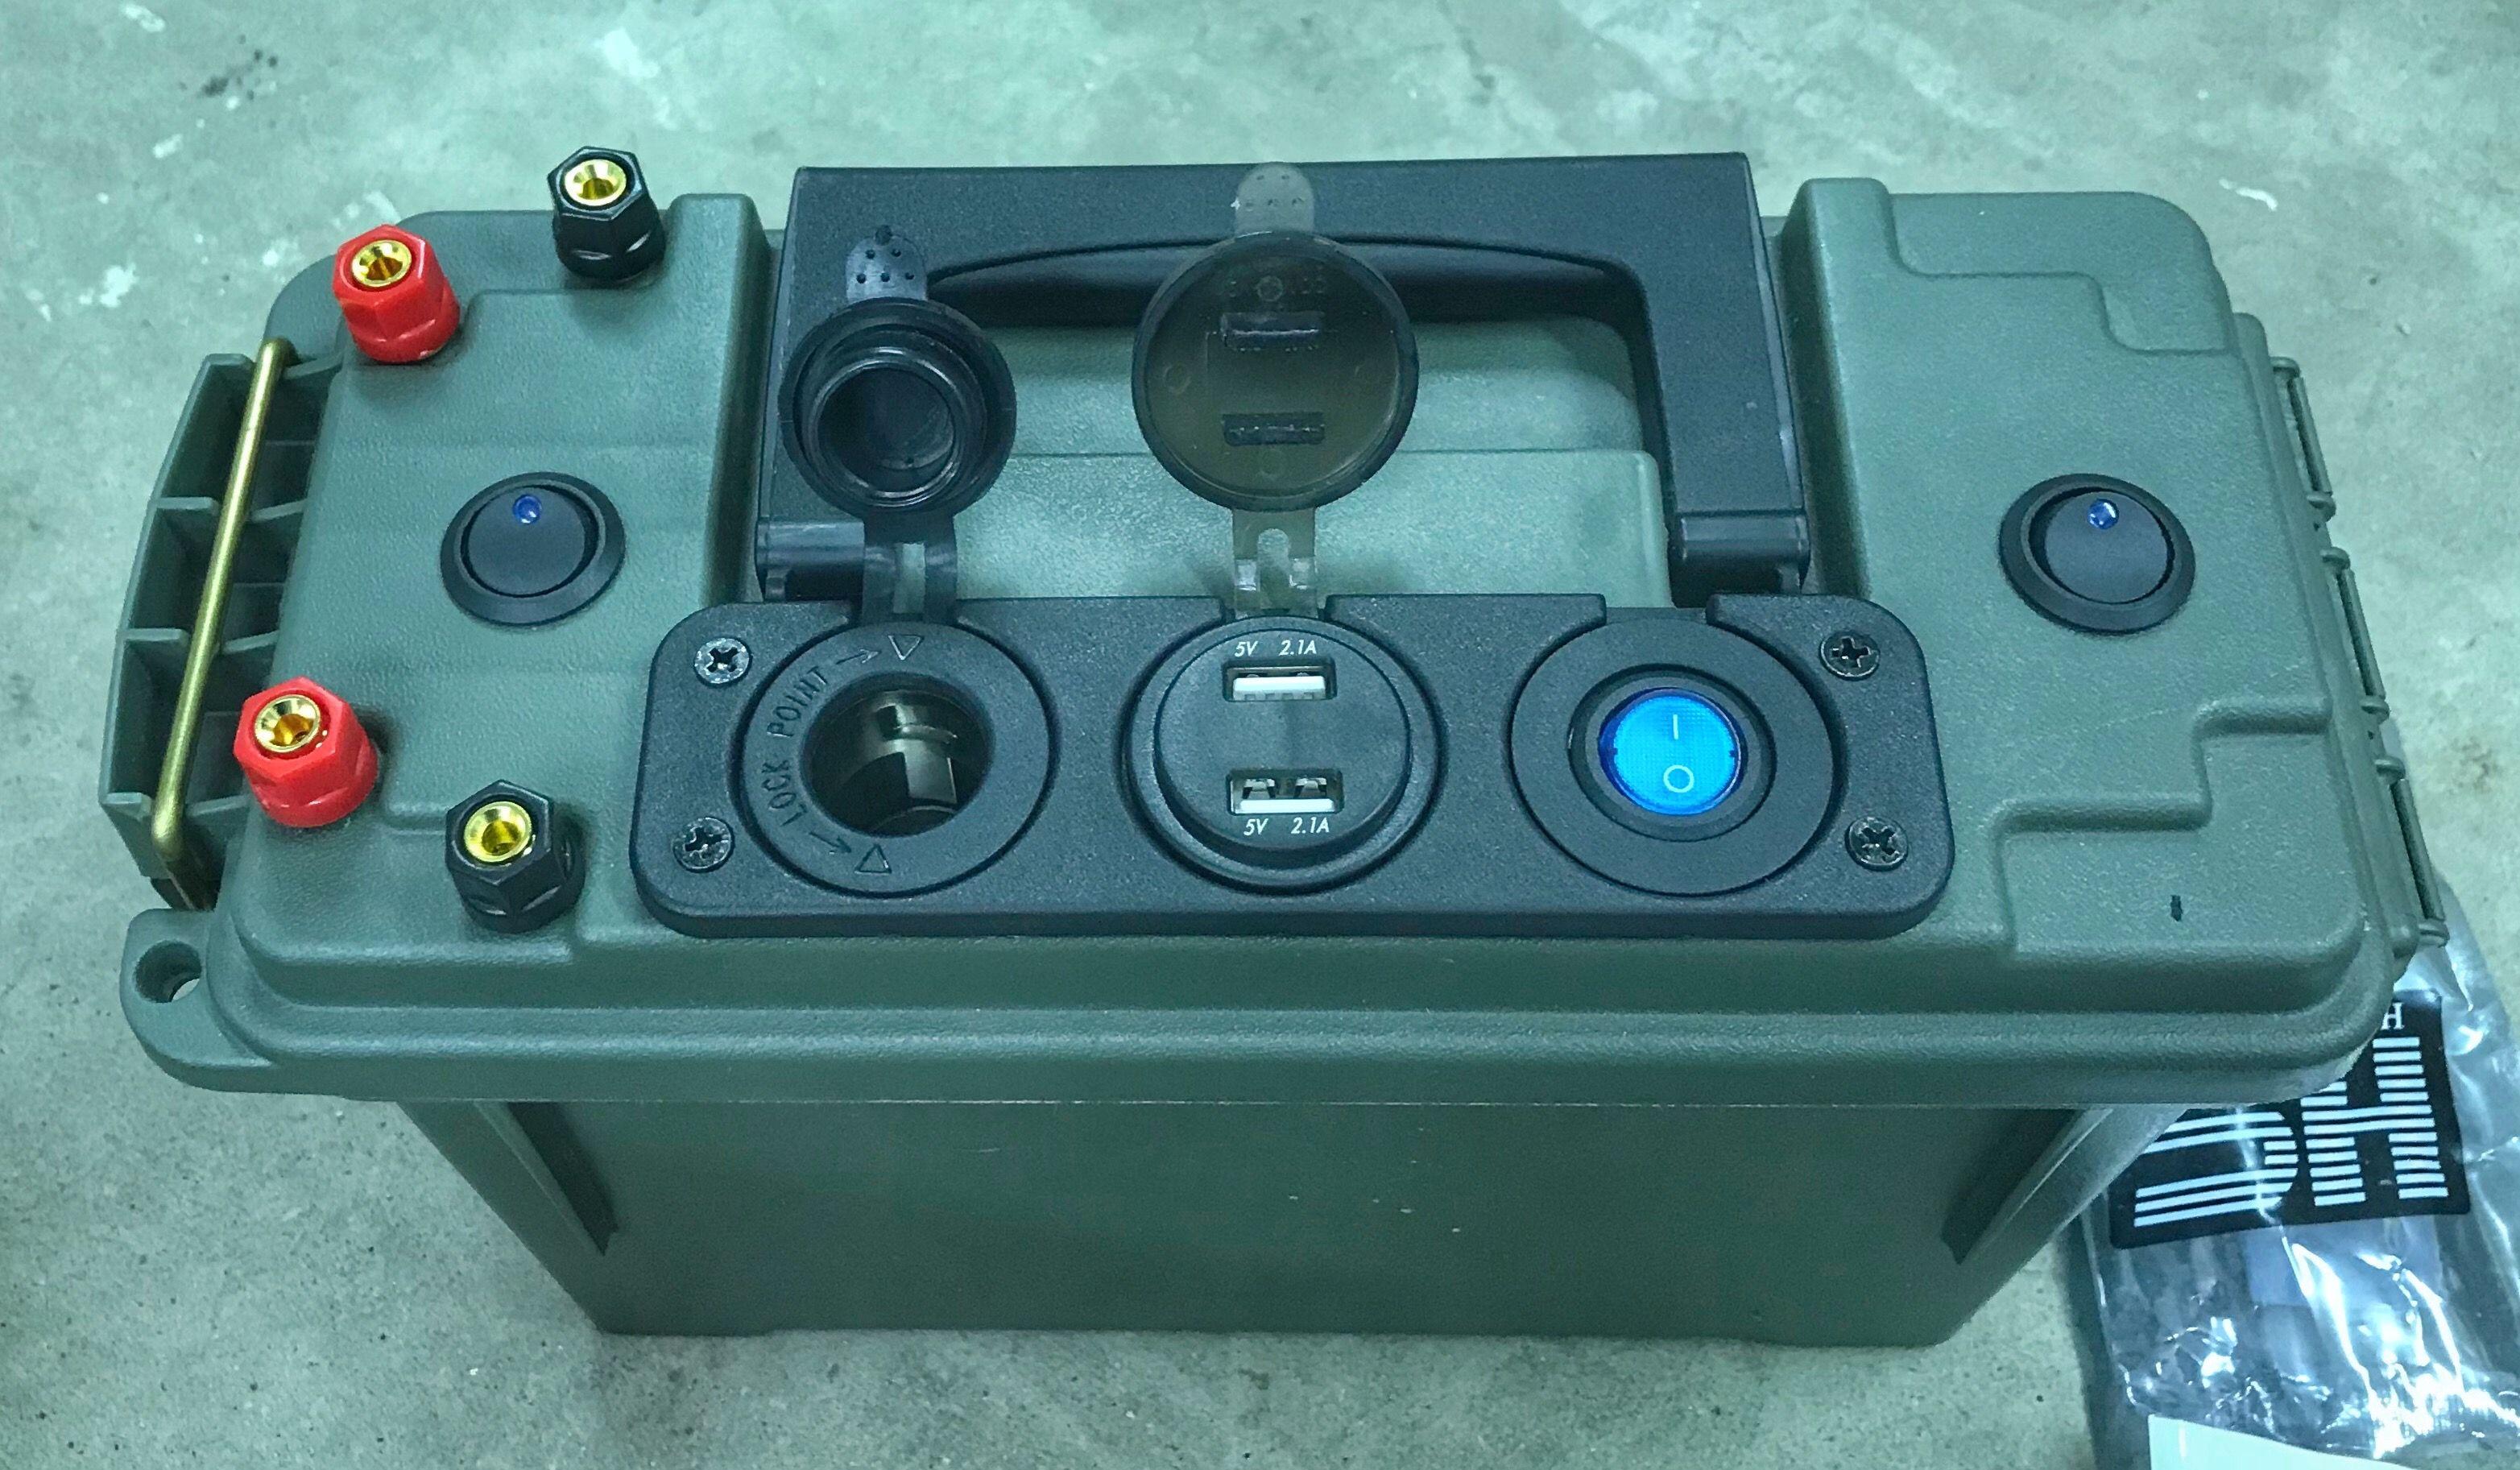 c7a373771c346bb8fd1f5d7c7390fed0 12 volt battery box volt meter illuminates between usb plugs left